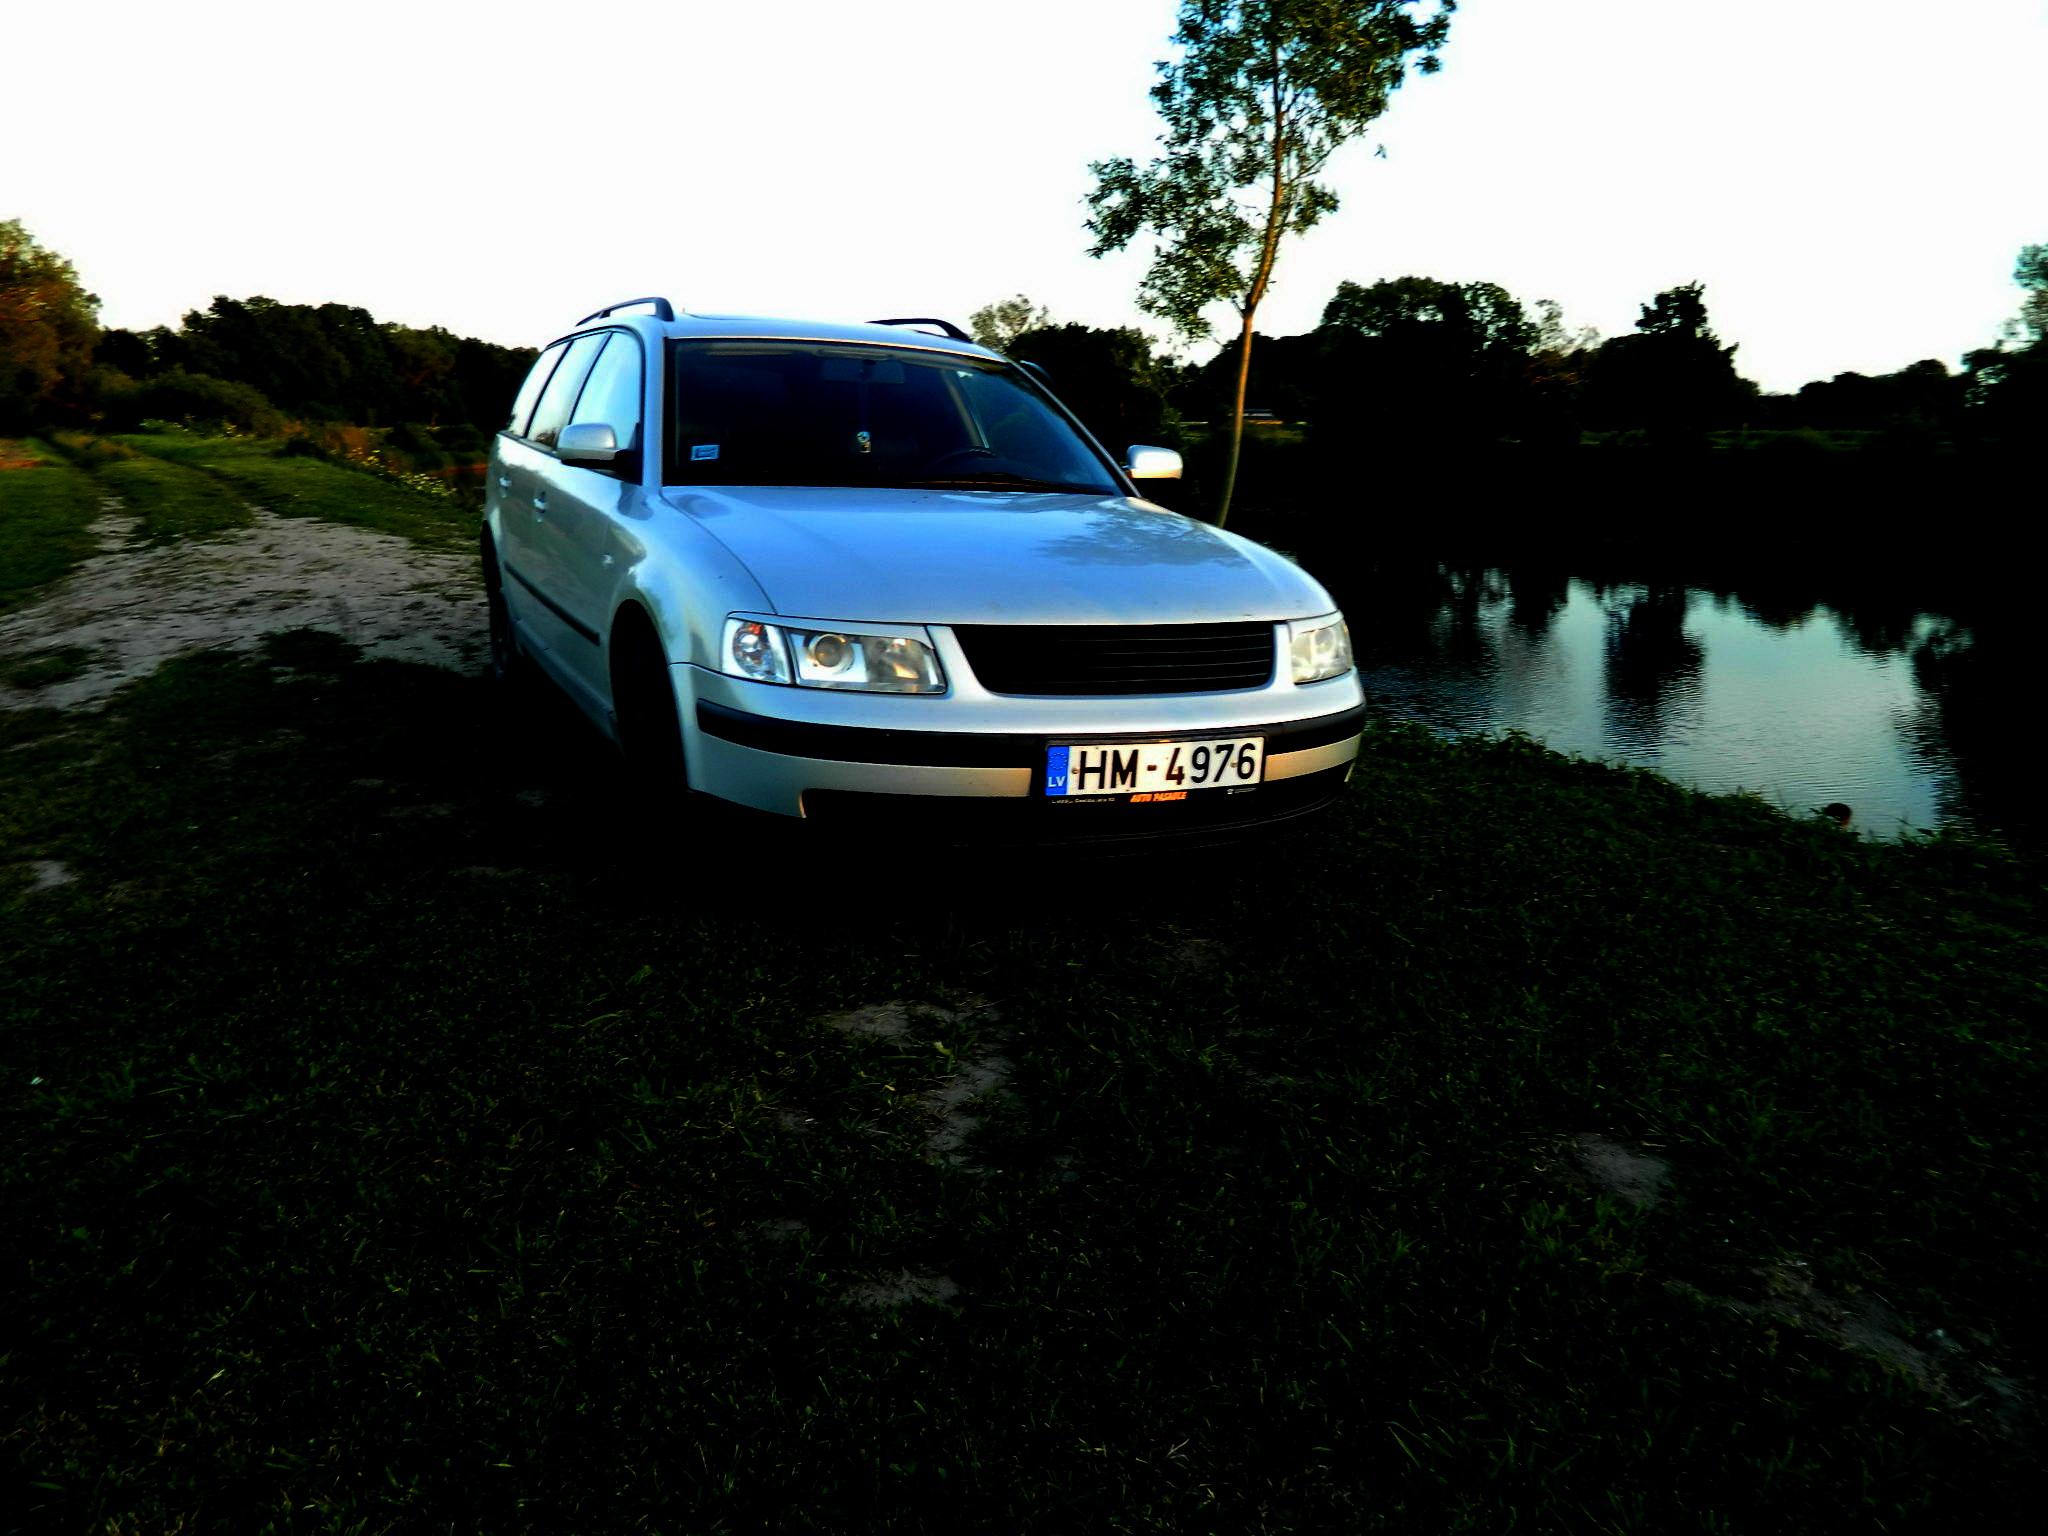 www.bildites.lv/images/uo76rbjhhpwm5yt3q25i.jpg